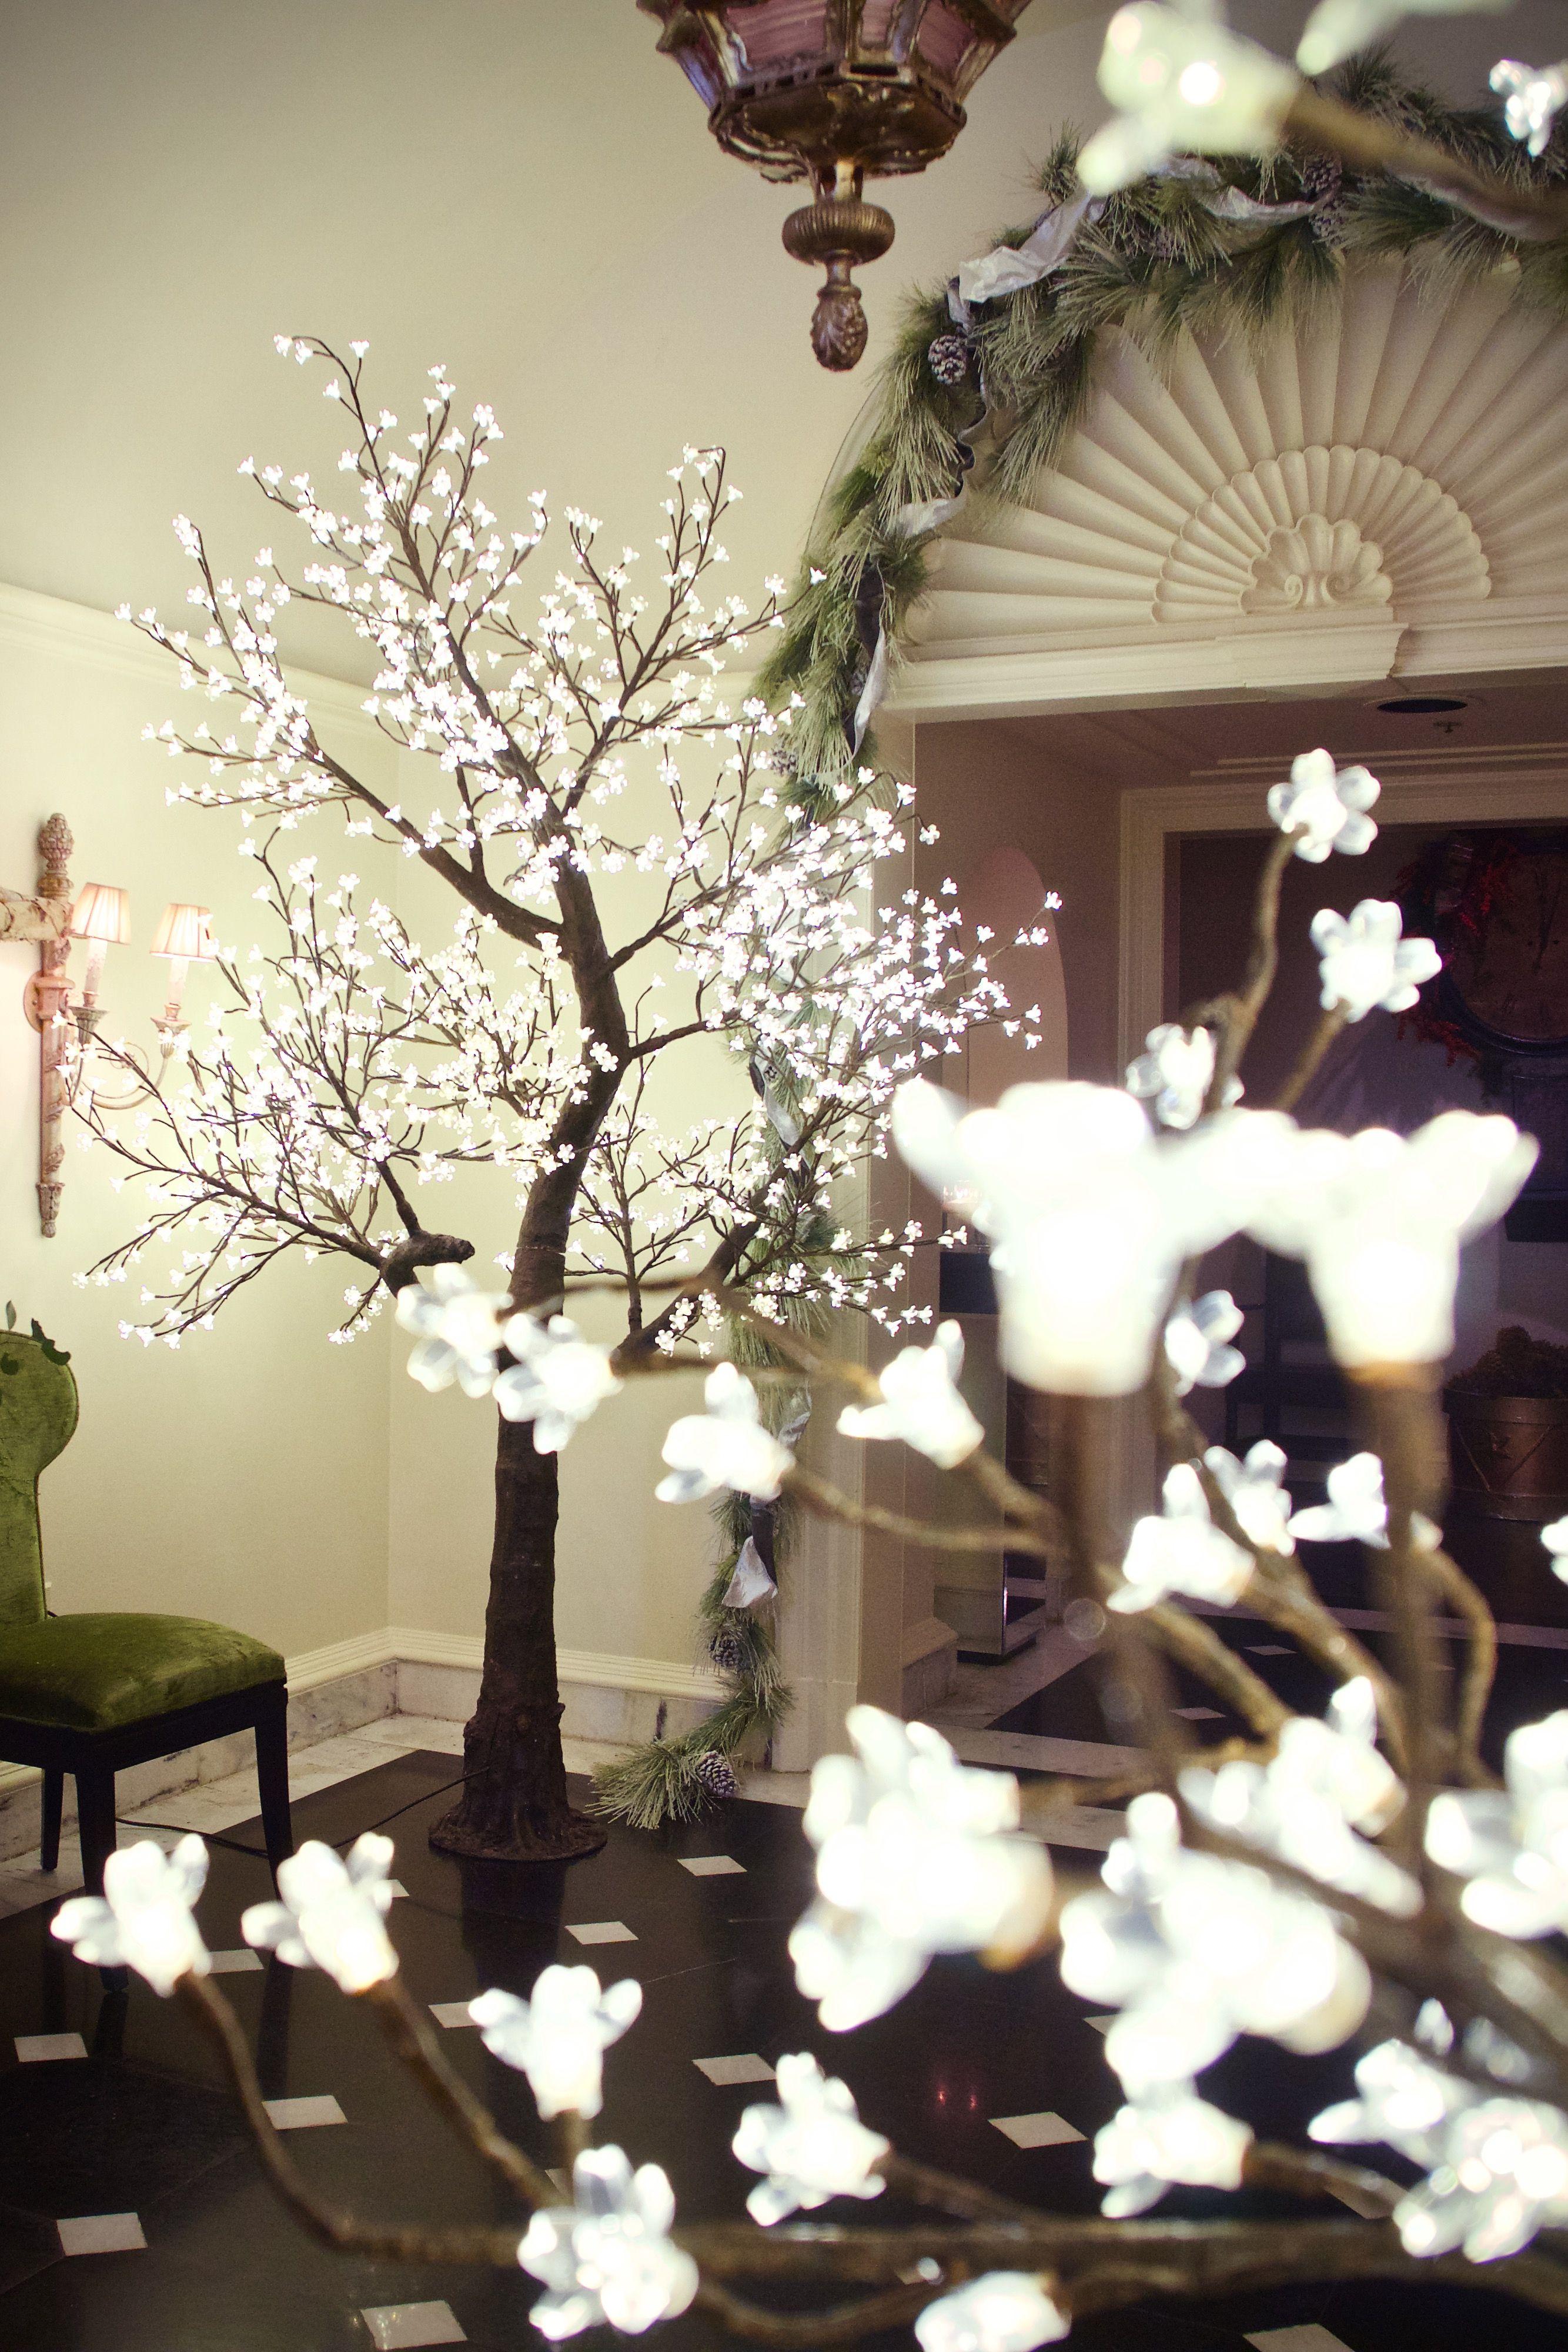 Source 2m High Led Cherry Tree Led Cherry Blossom Tree Light Led Tree On M Alibaba Com Cherry Blossom Tree Led Tree Cherry Tree